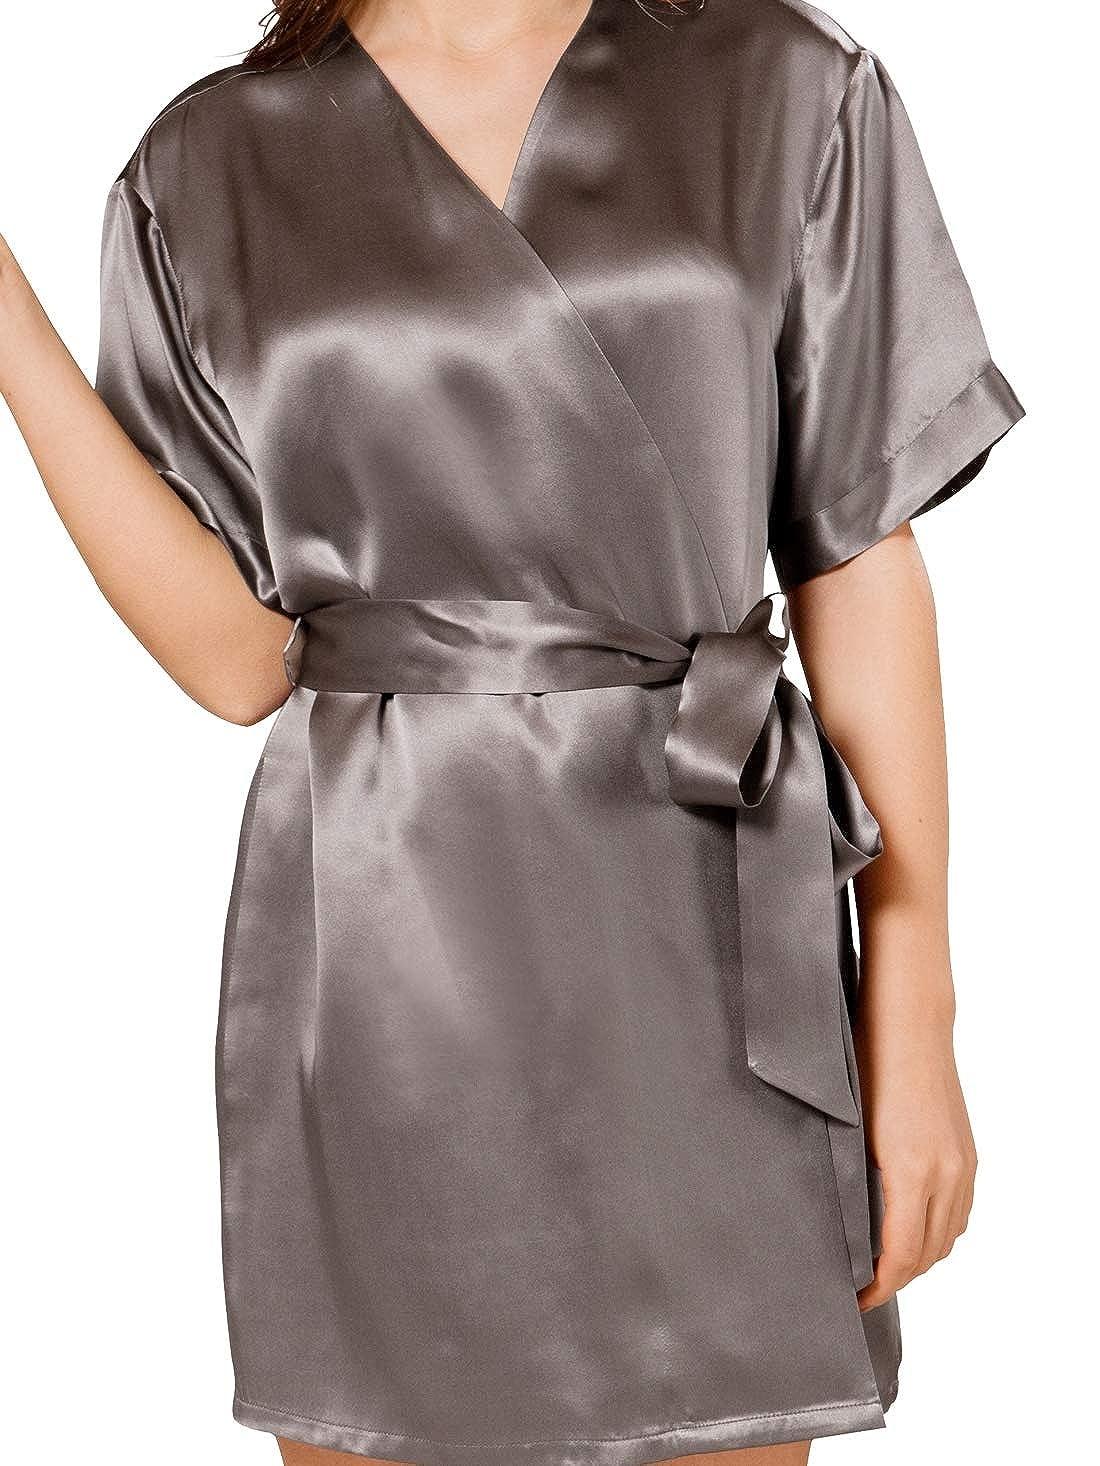 ElleSilk 100% Seide Morgenmantel Damen, Damen, Damen, Kurz Badmantel Kimono 22mm Maulbeerseide B01ARB1B6S Morgenmntel 1551ae